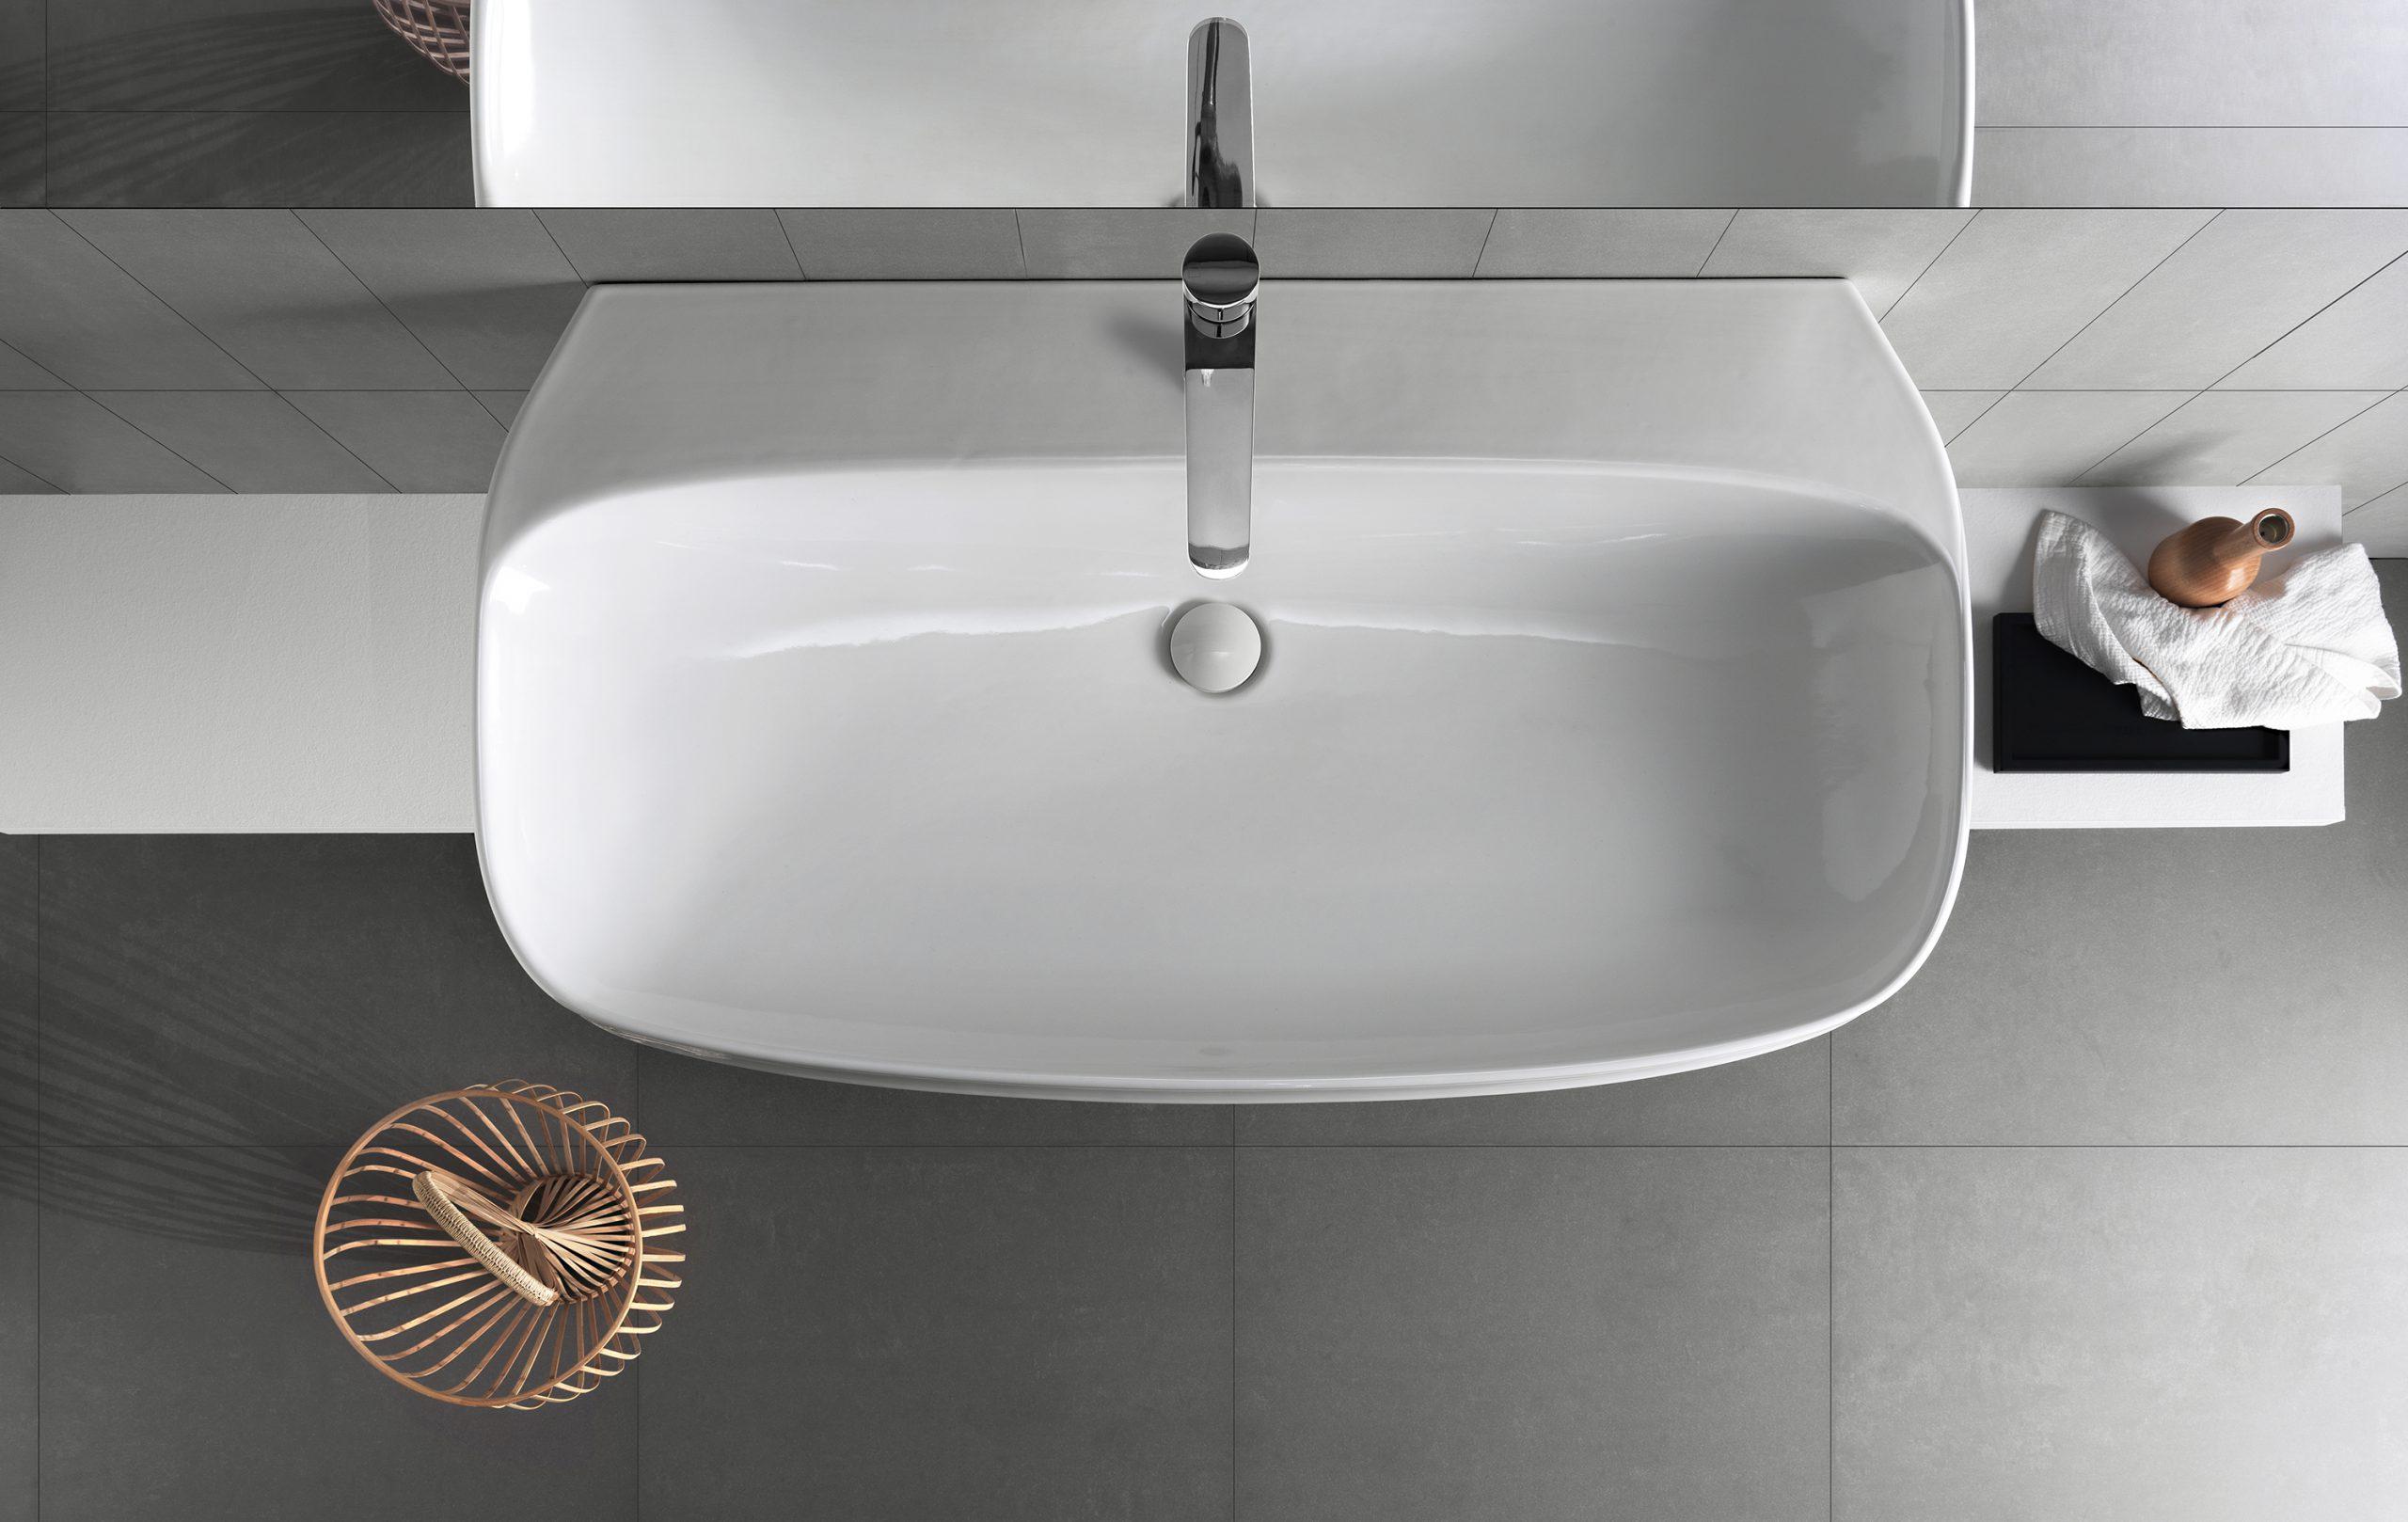 Abito wallhung washbasin by Debiasi Sandri for Hatria